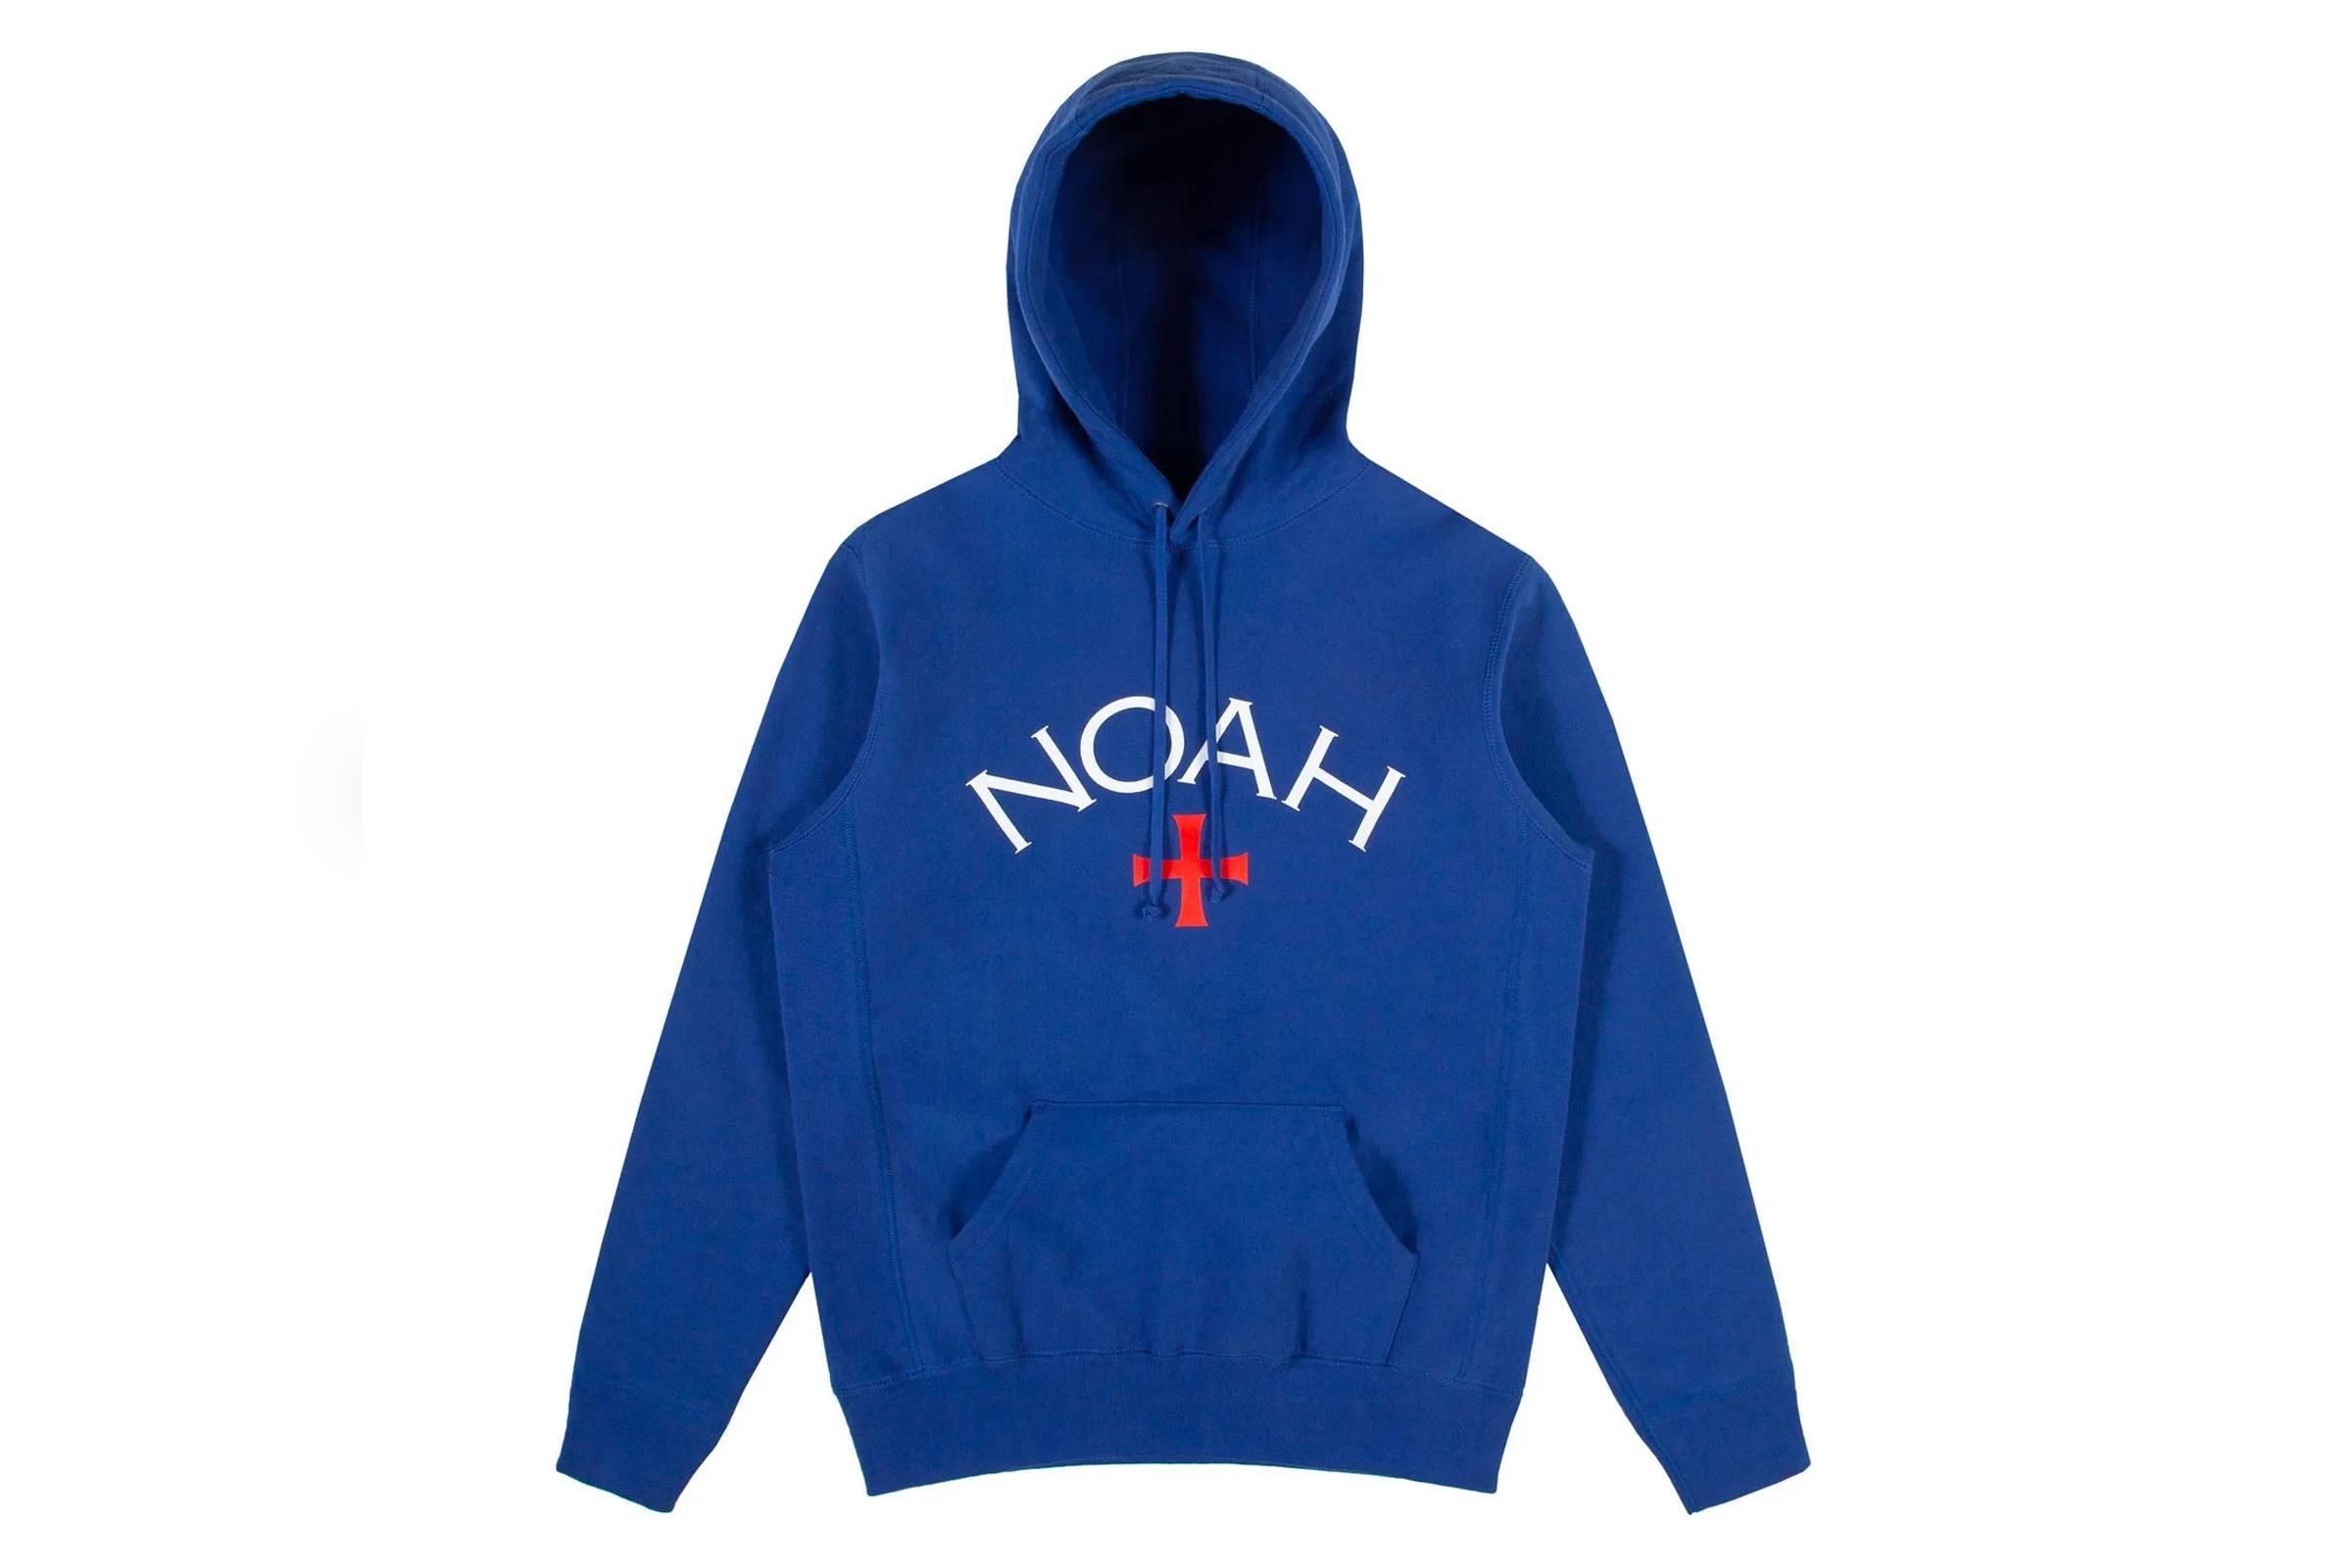 10. Noah Logo Hooded Sweatshirt